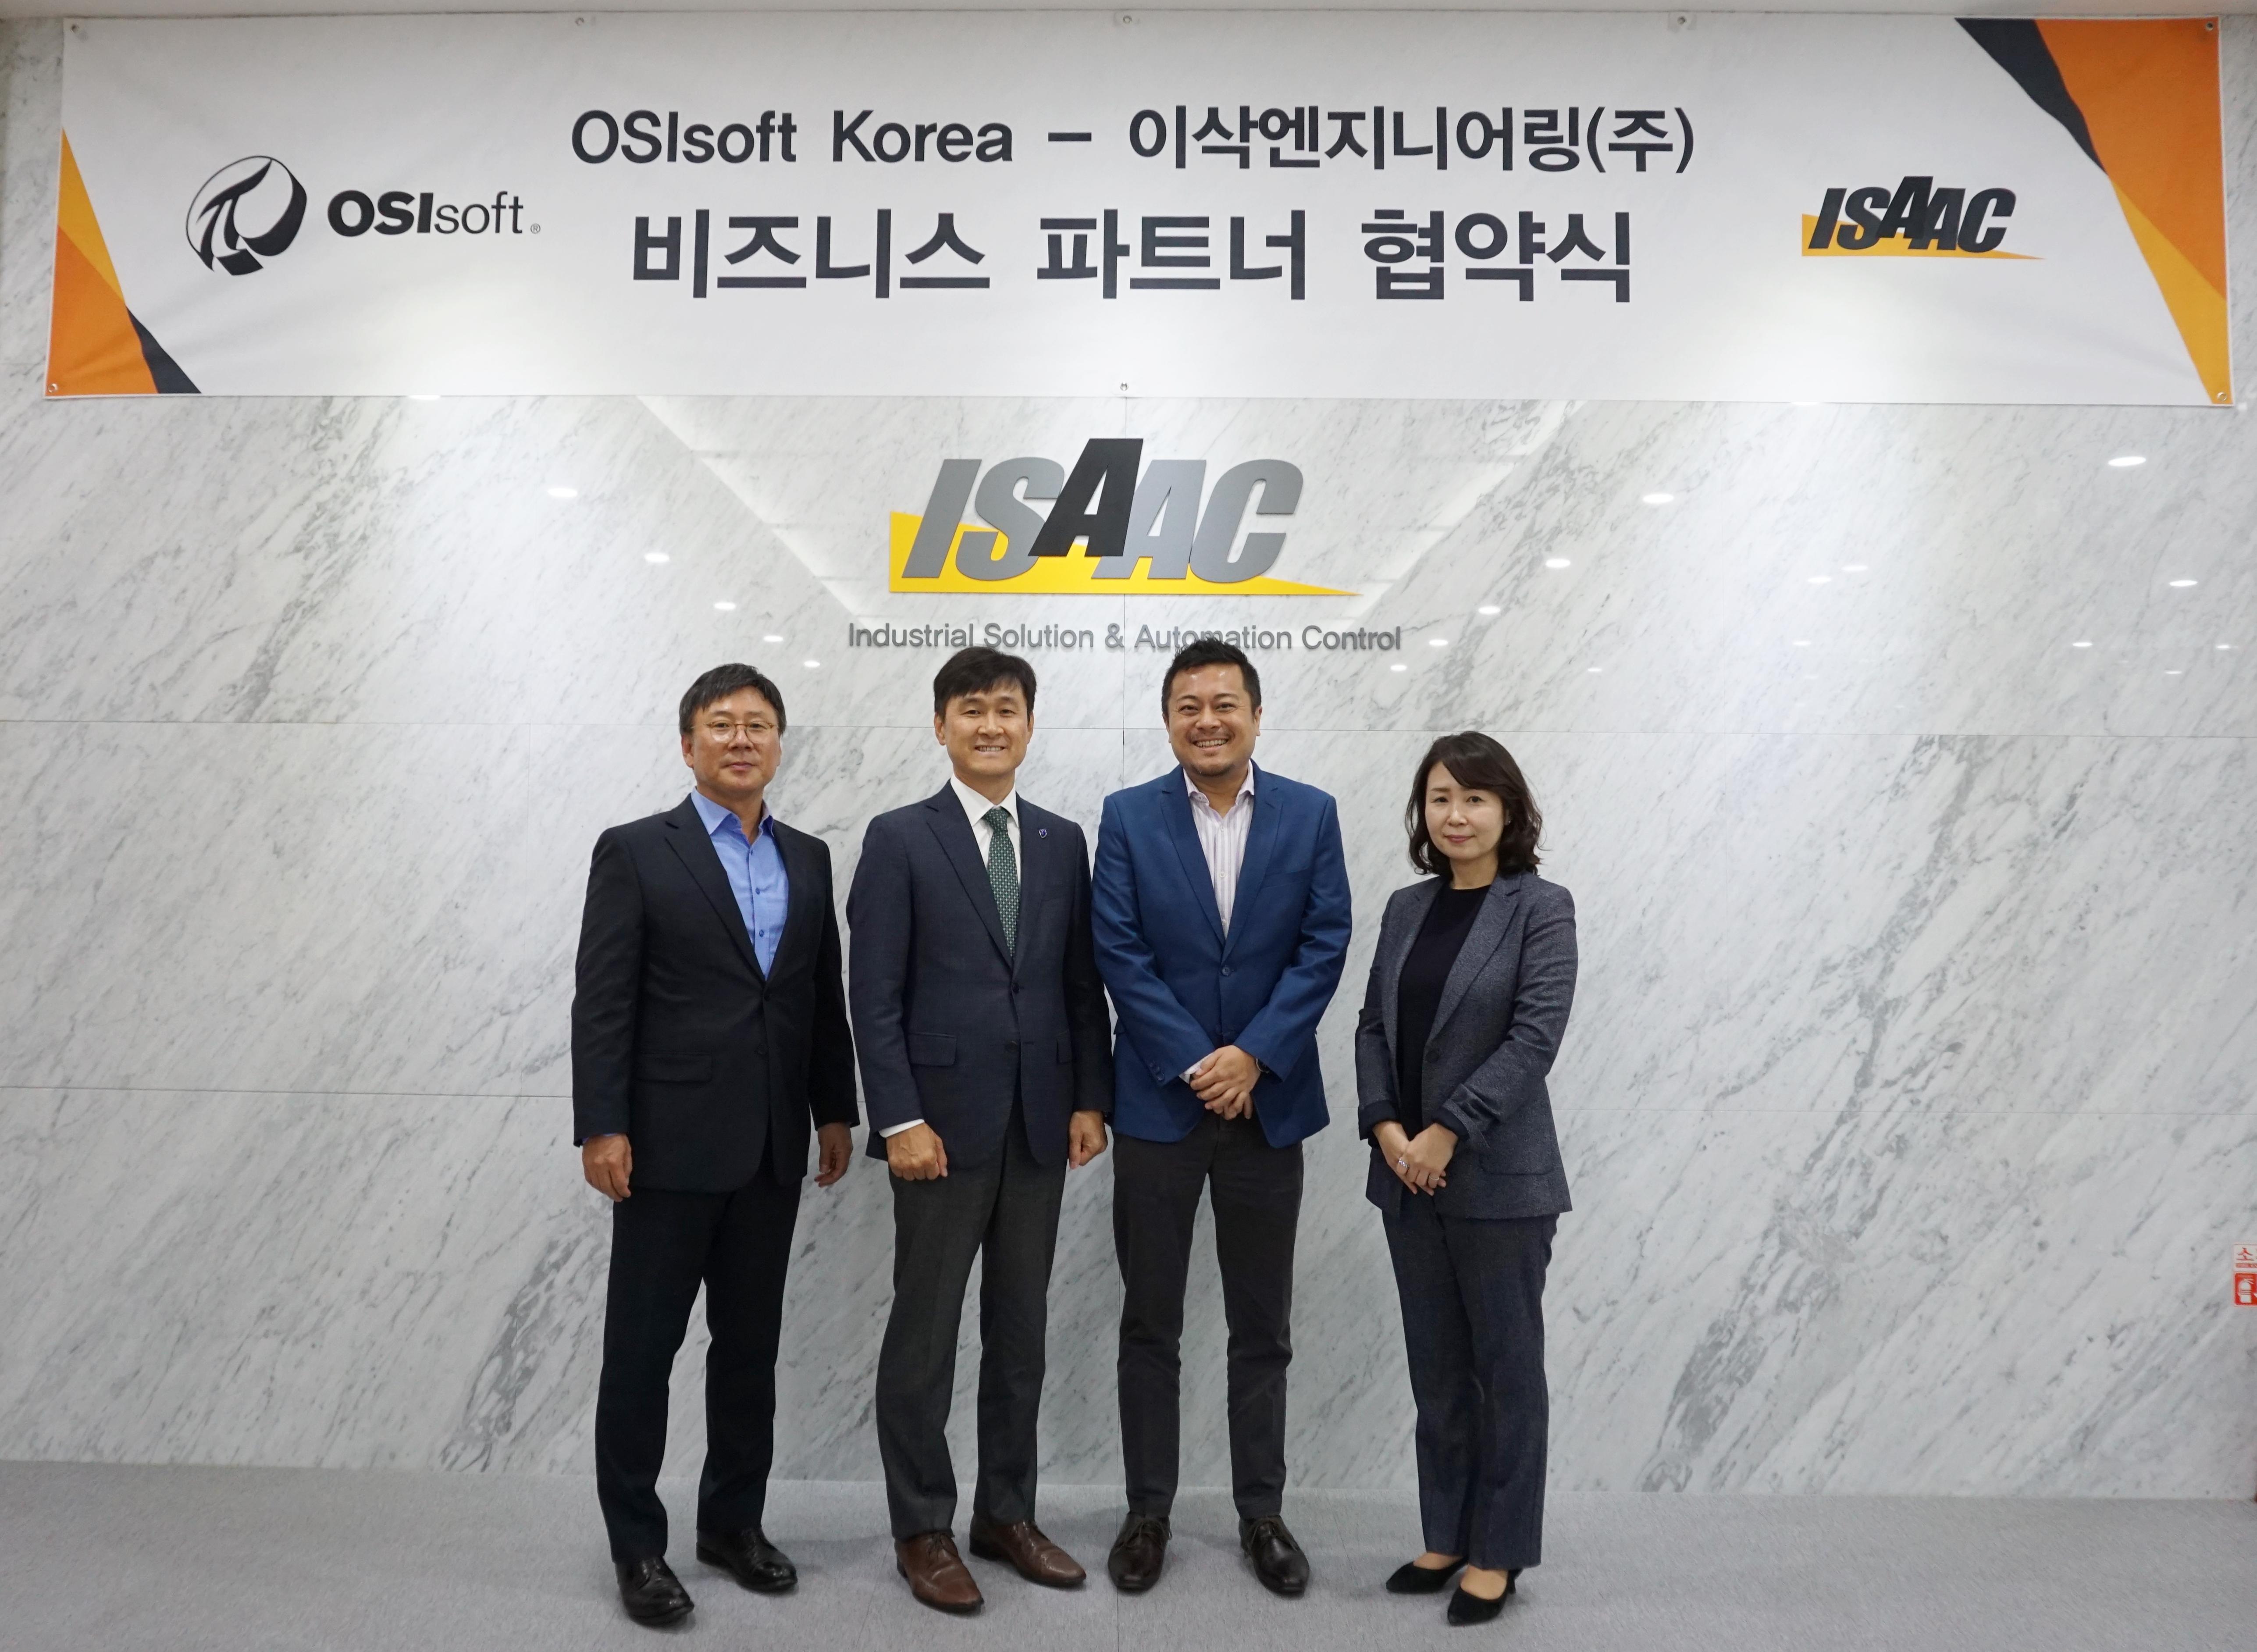 OSIsoft Business Partner Agreement